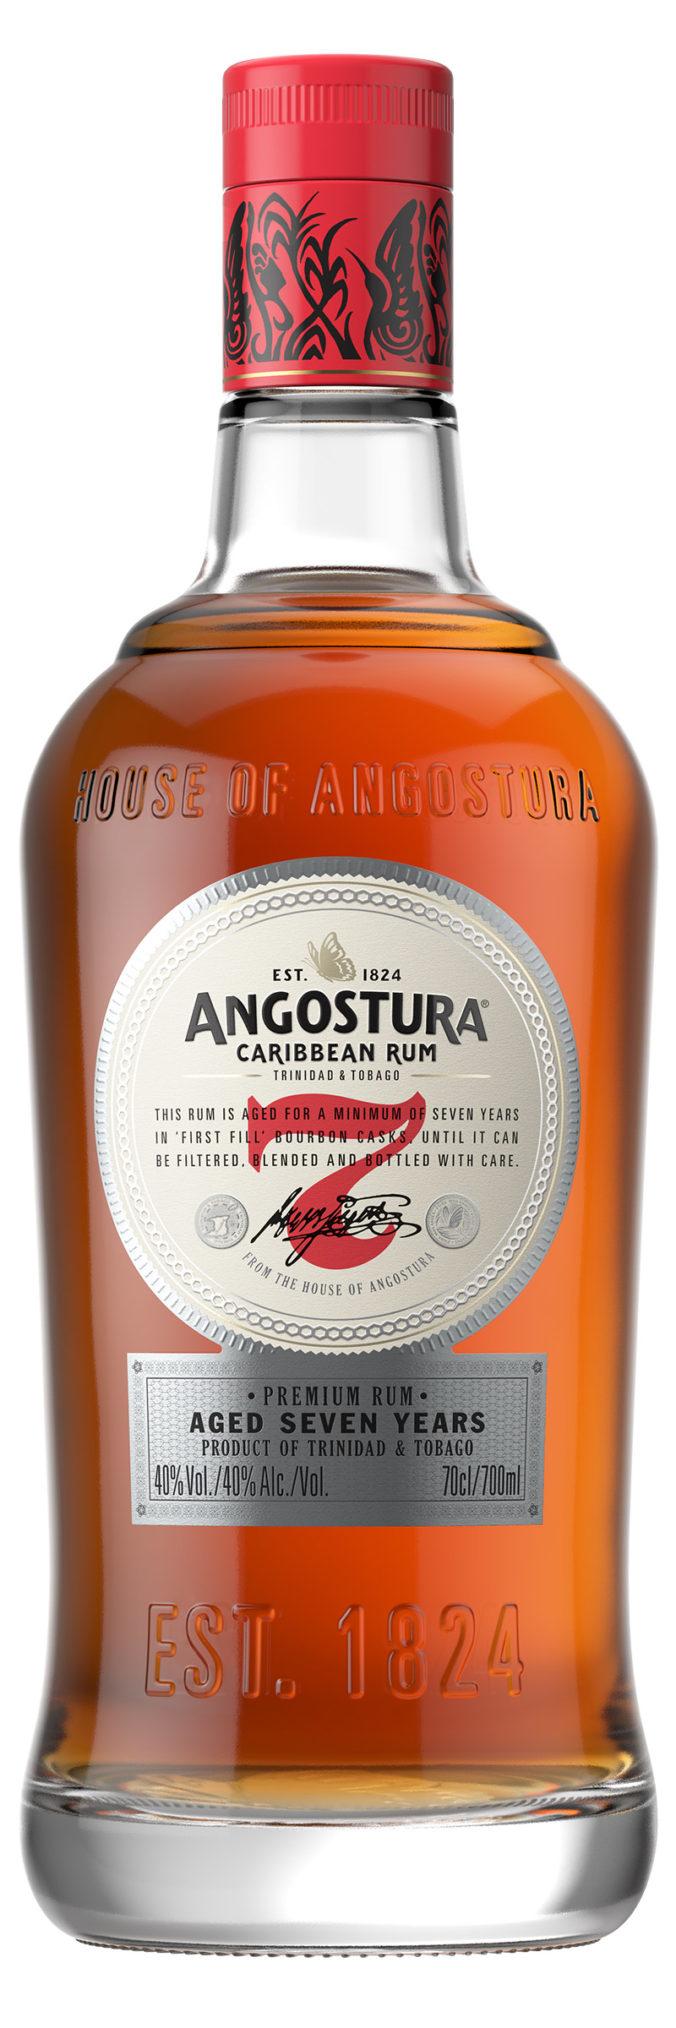 Angostura 7 year old Premium Rum from Trinidad